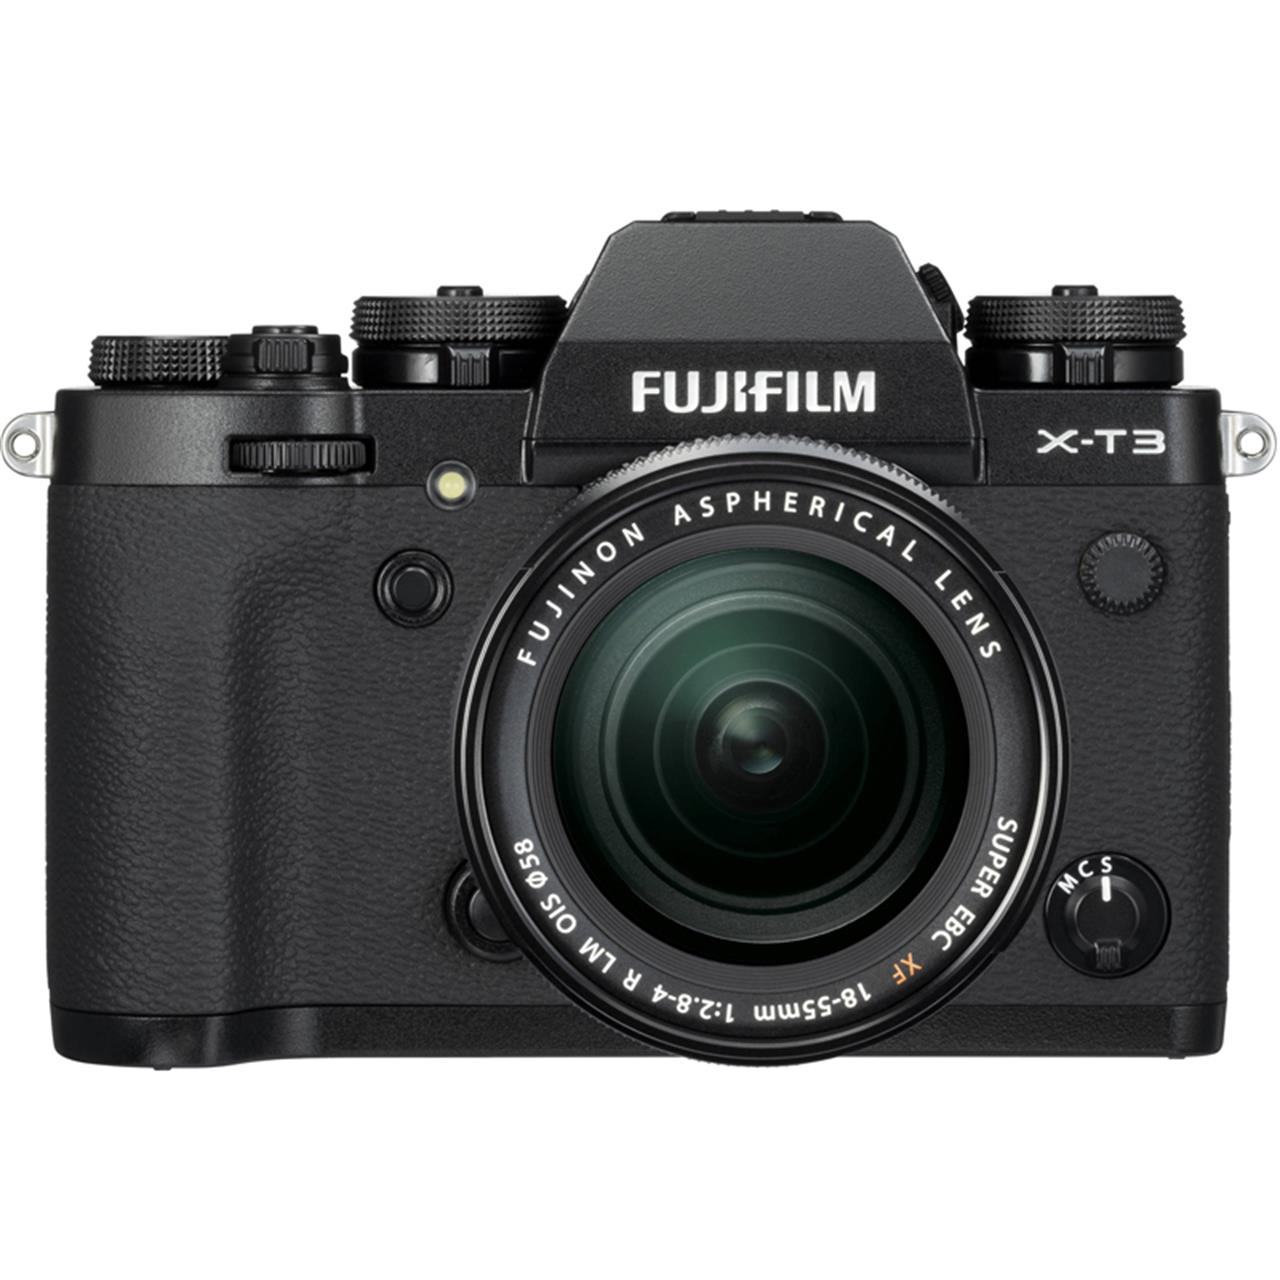 4547410378061__fujifilm_x-t3_black_18-55mm_hofma.jpg